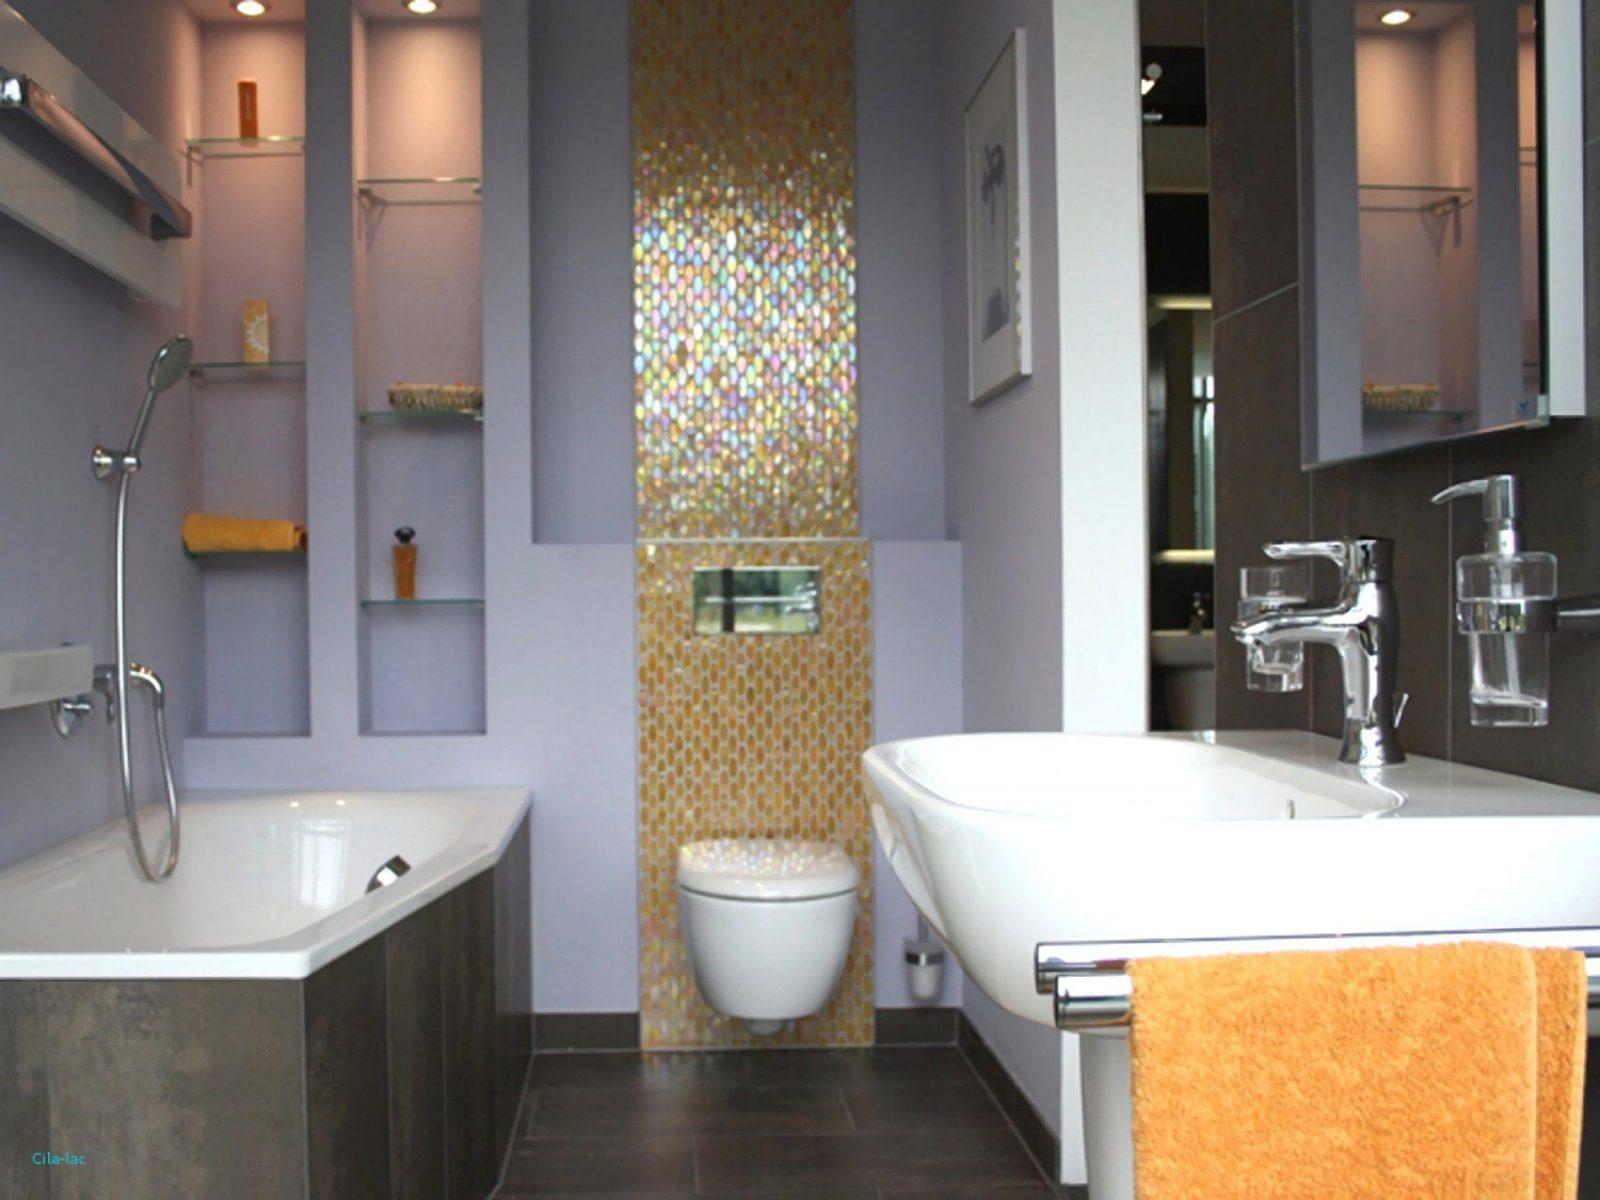 Elegantes Bodenbelag Für Badezimmer Stunning Pvc Boden Im Bad von Pvc Boden Im Bad Bild